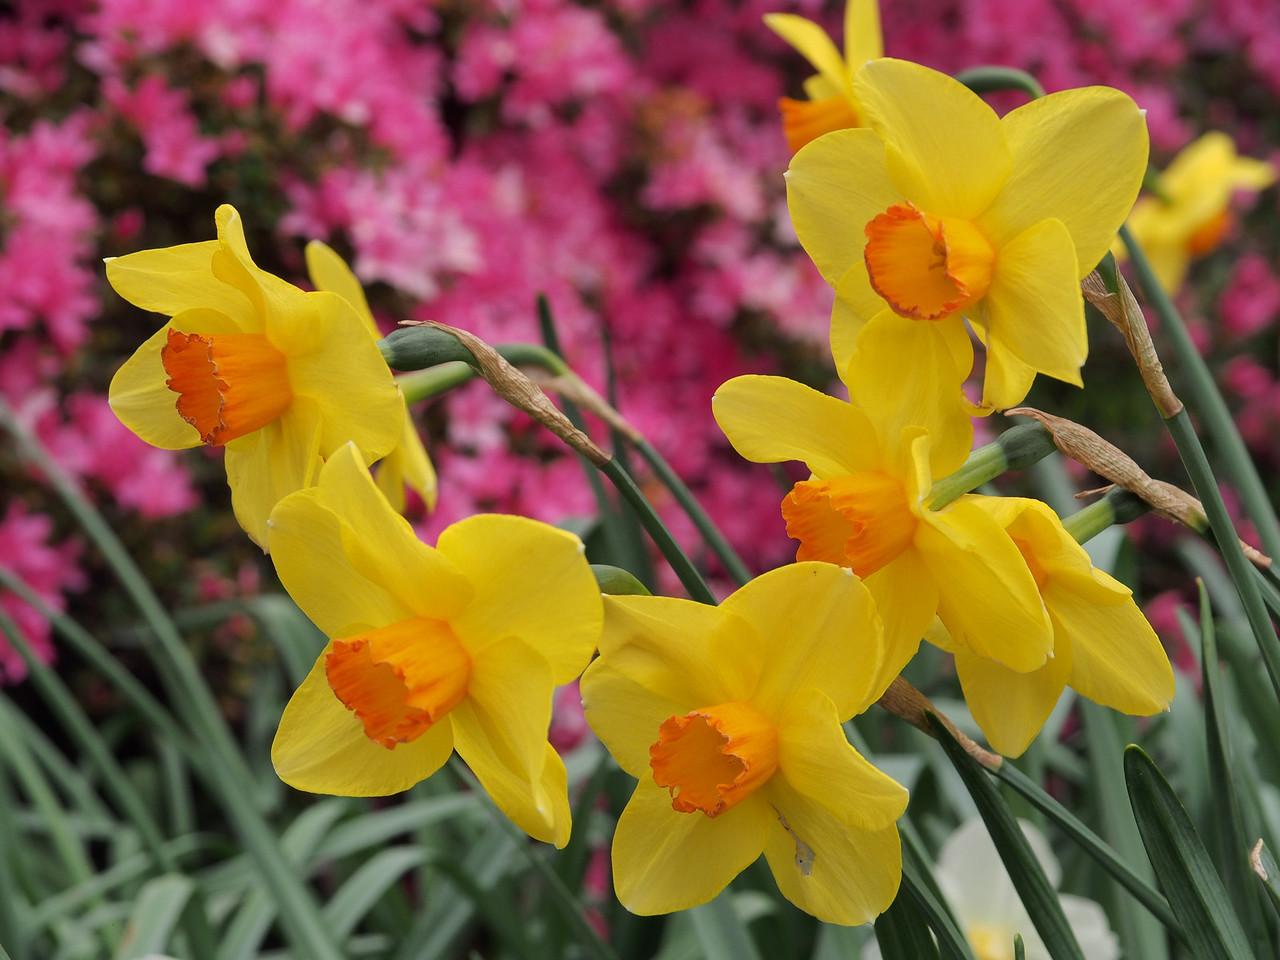 20130914_1558_2794 daffodils